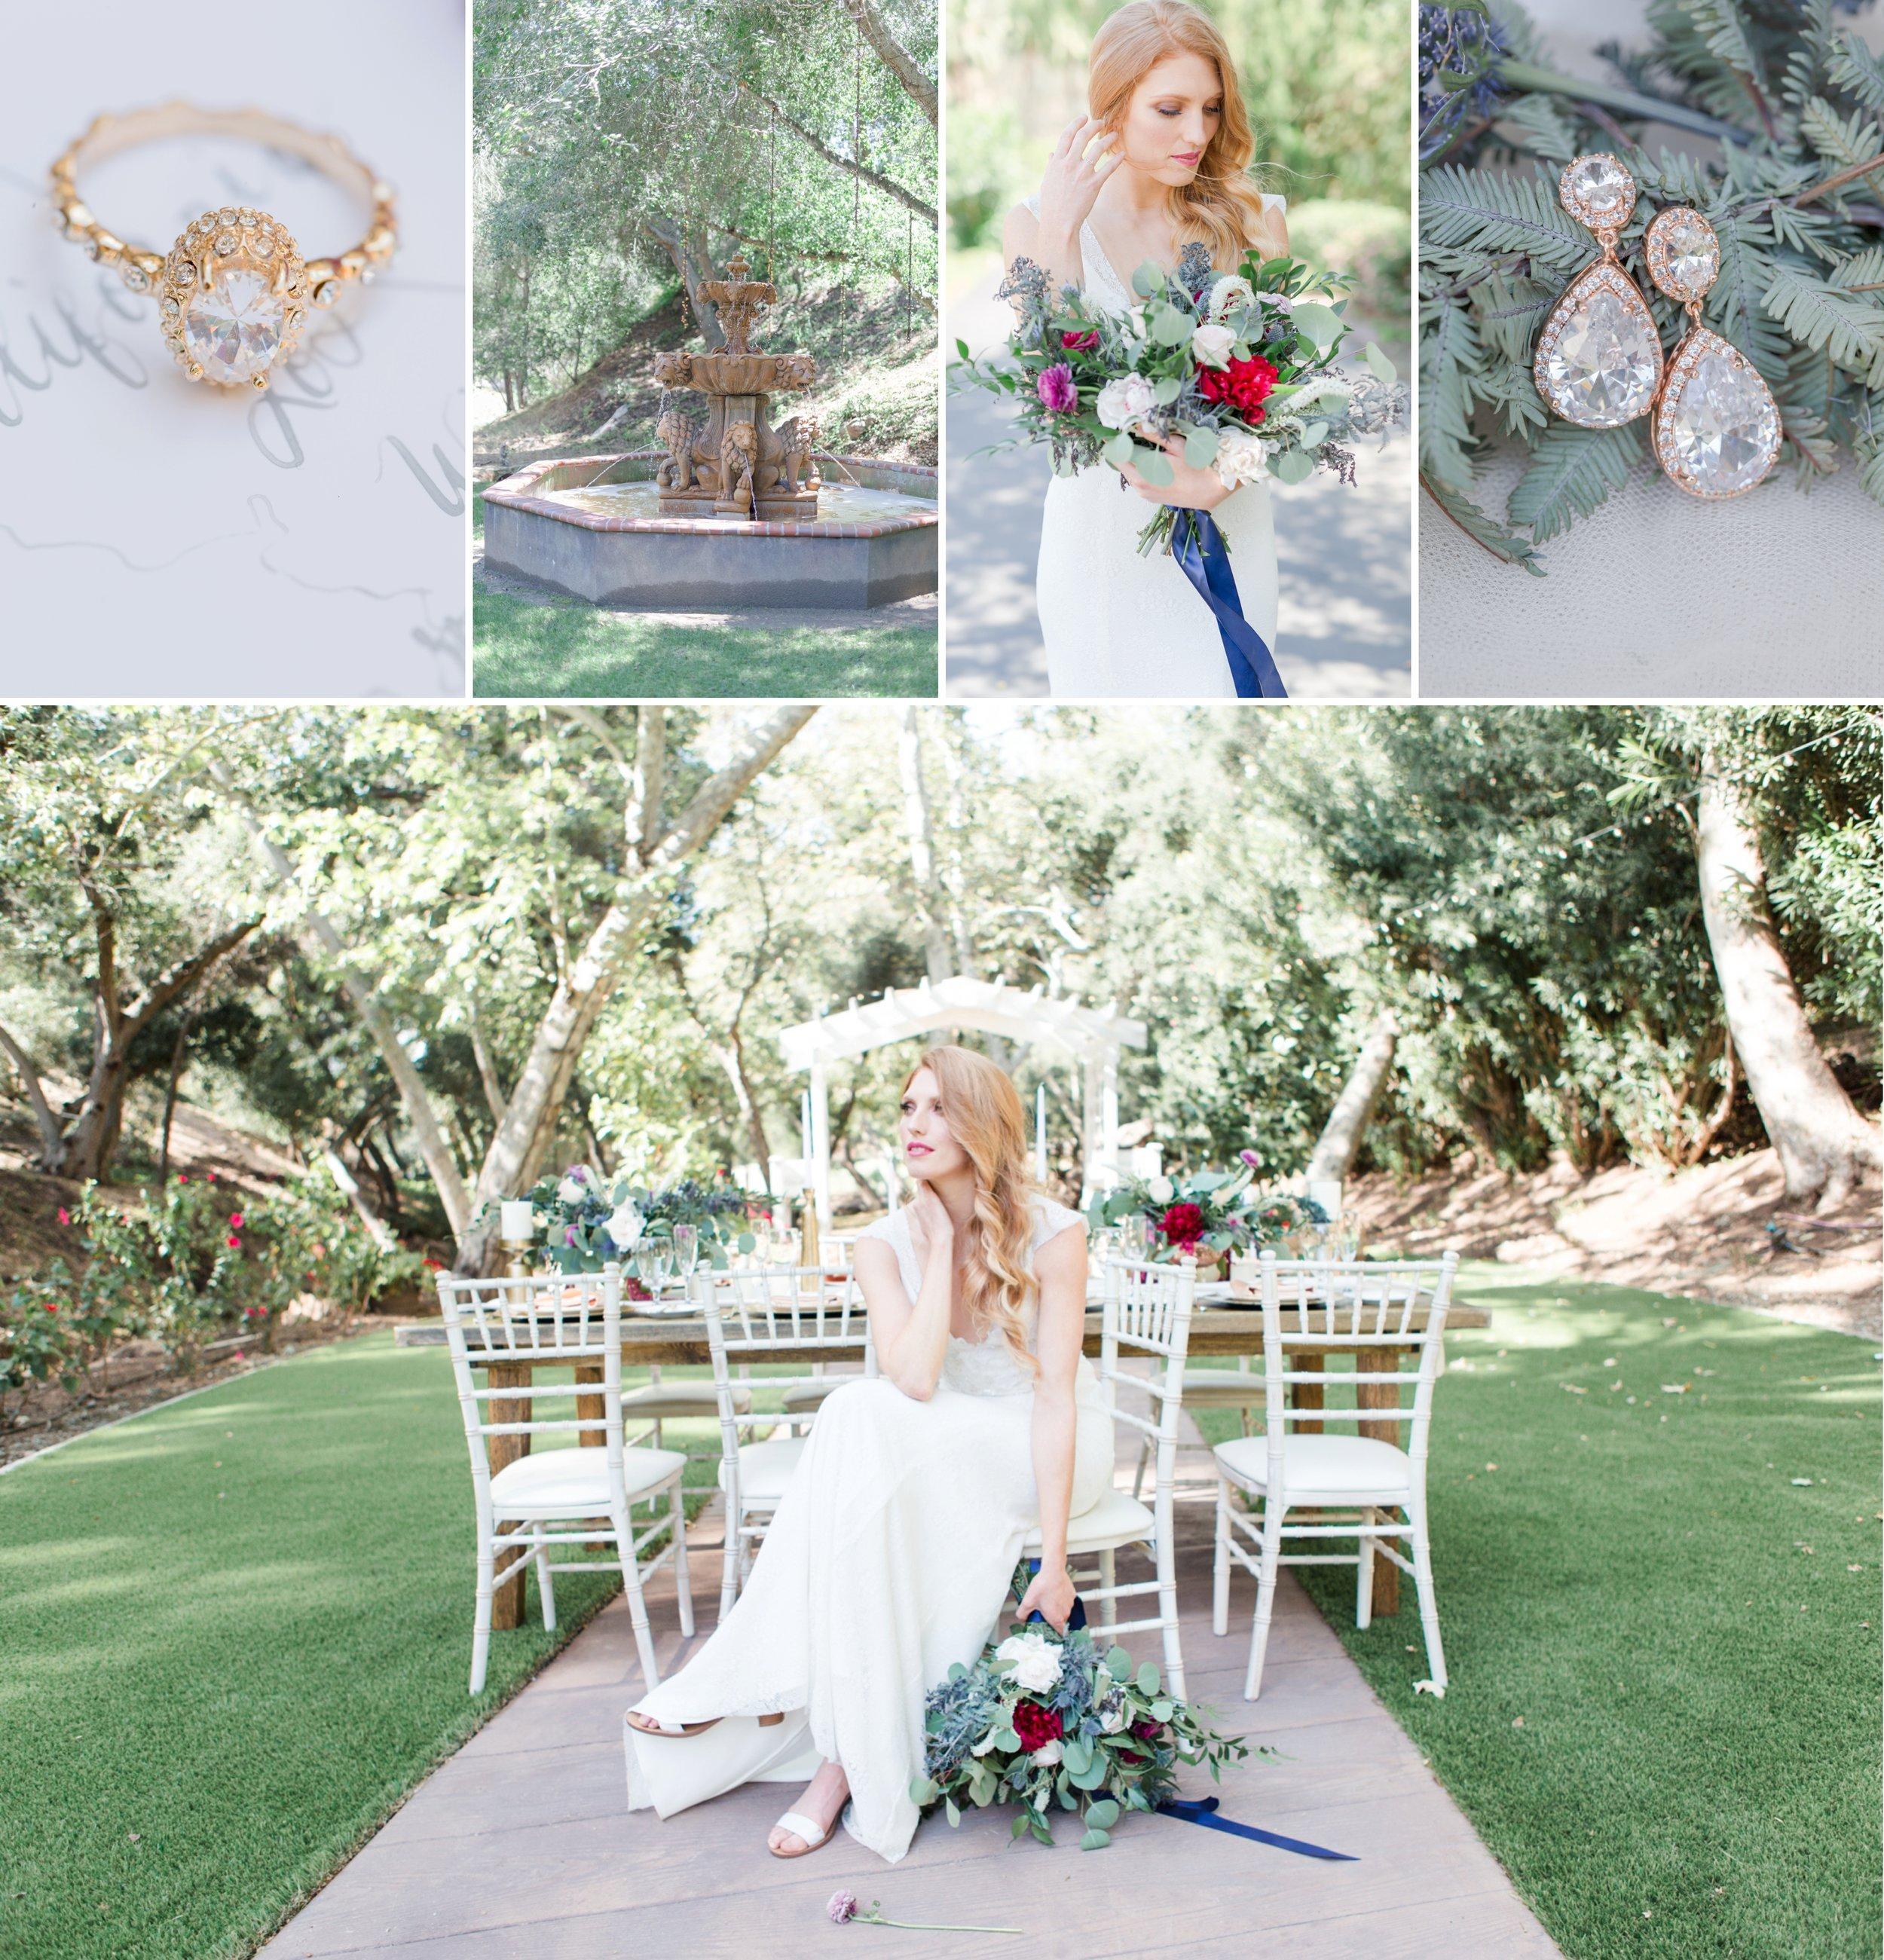 Los Willows Wedding Estate fallbrook california, temecula wedding photographer carrie mcguire.com